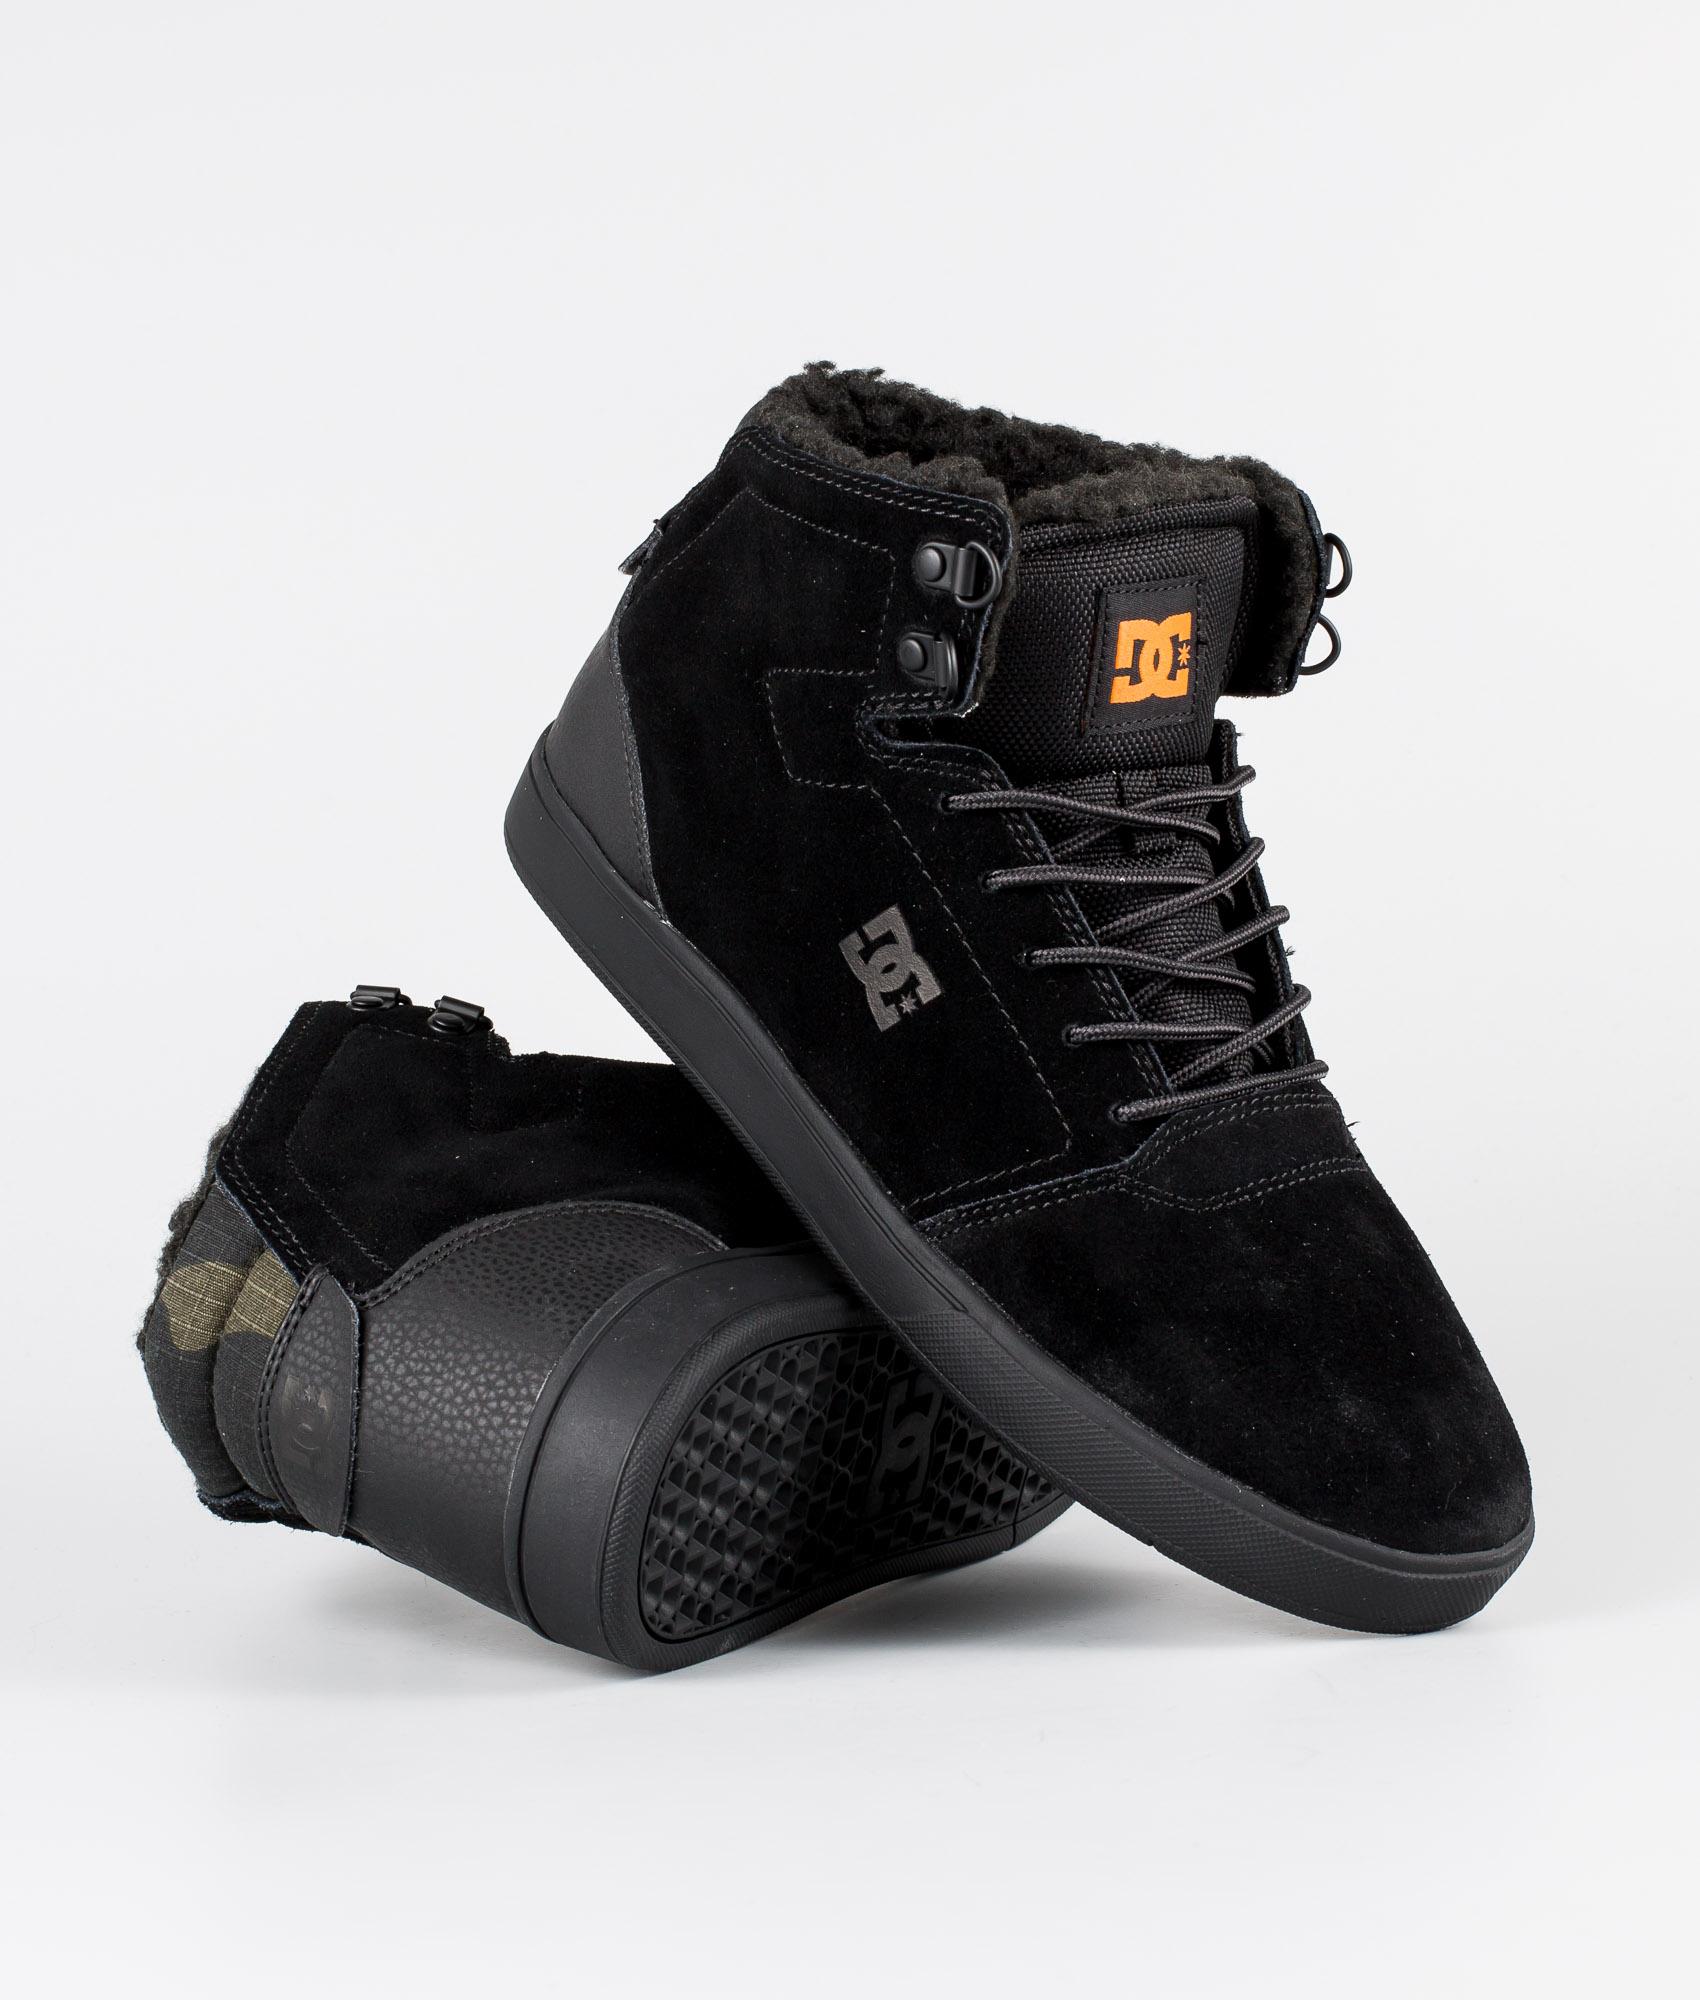 DC Crisis High Wnt Shoes Black/Camo